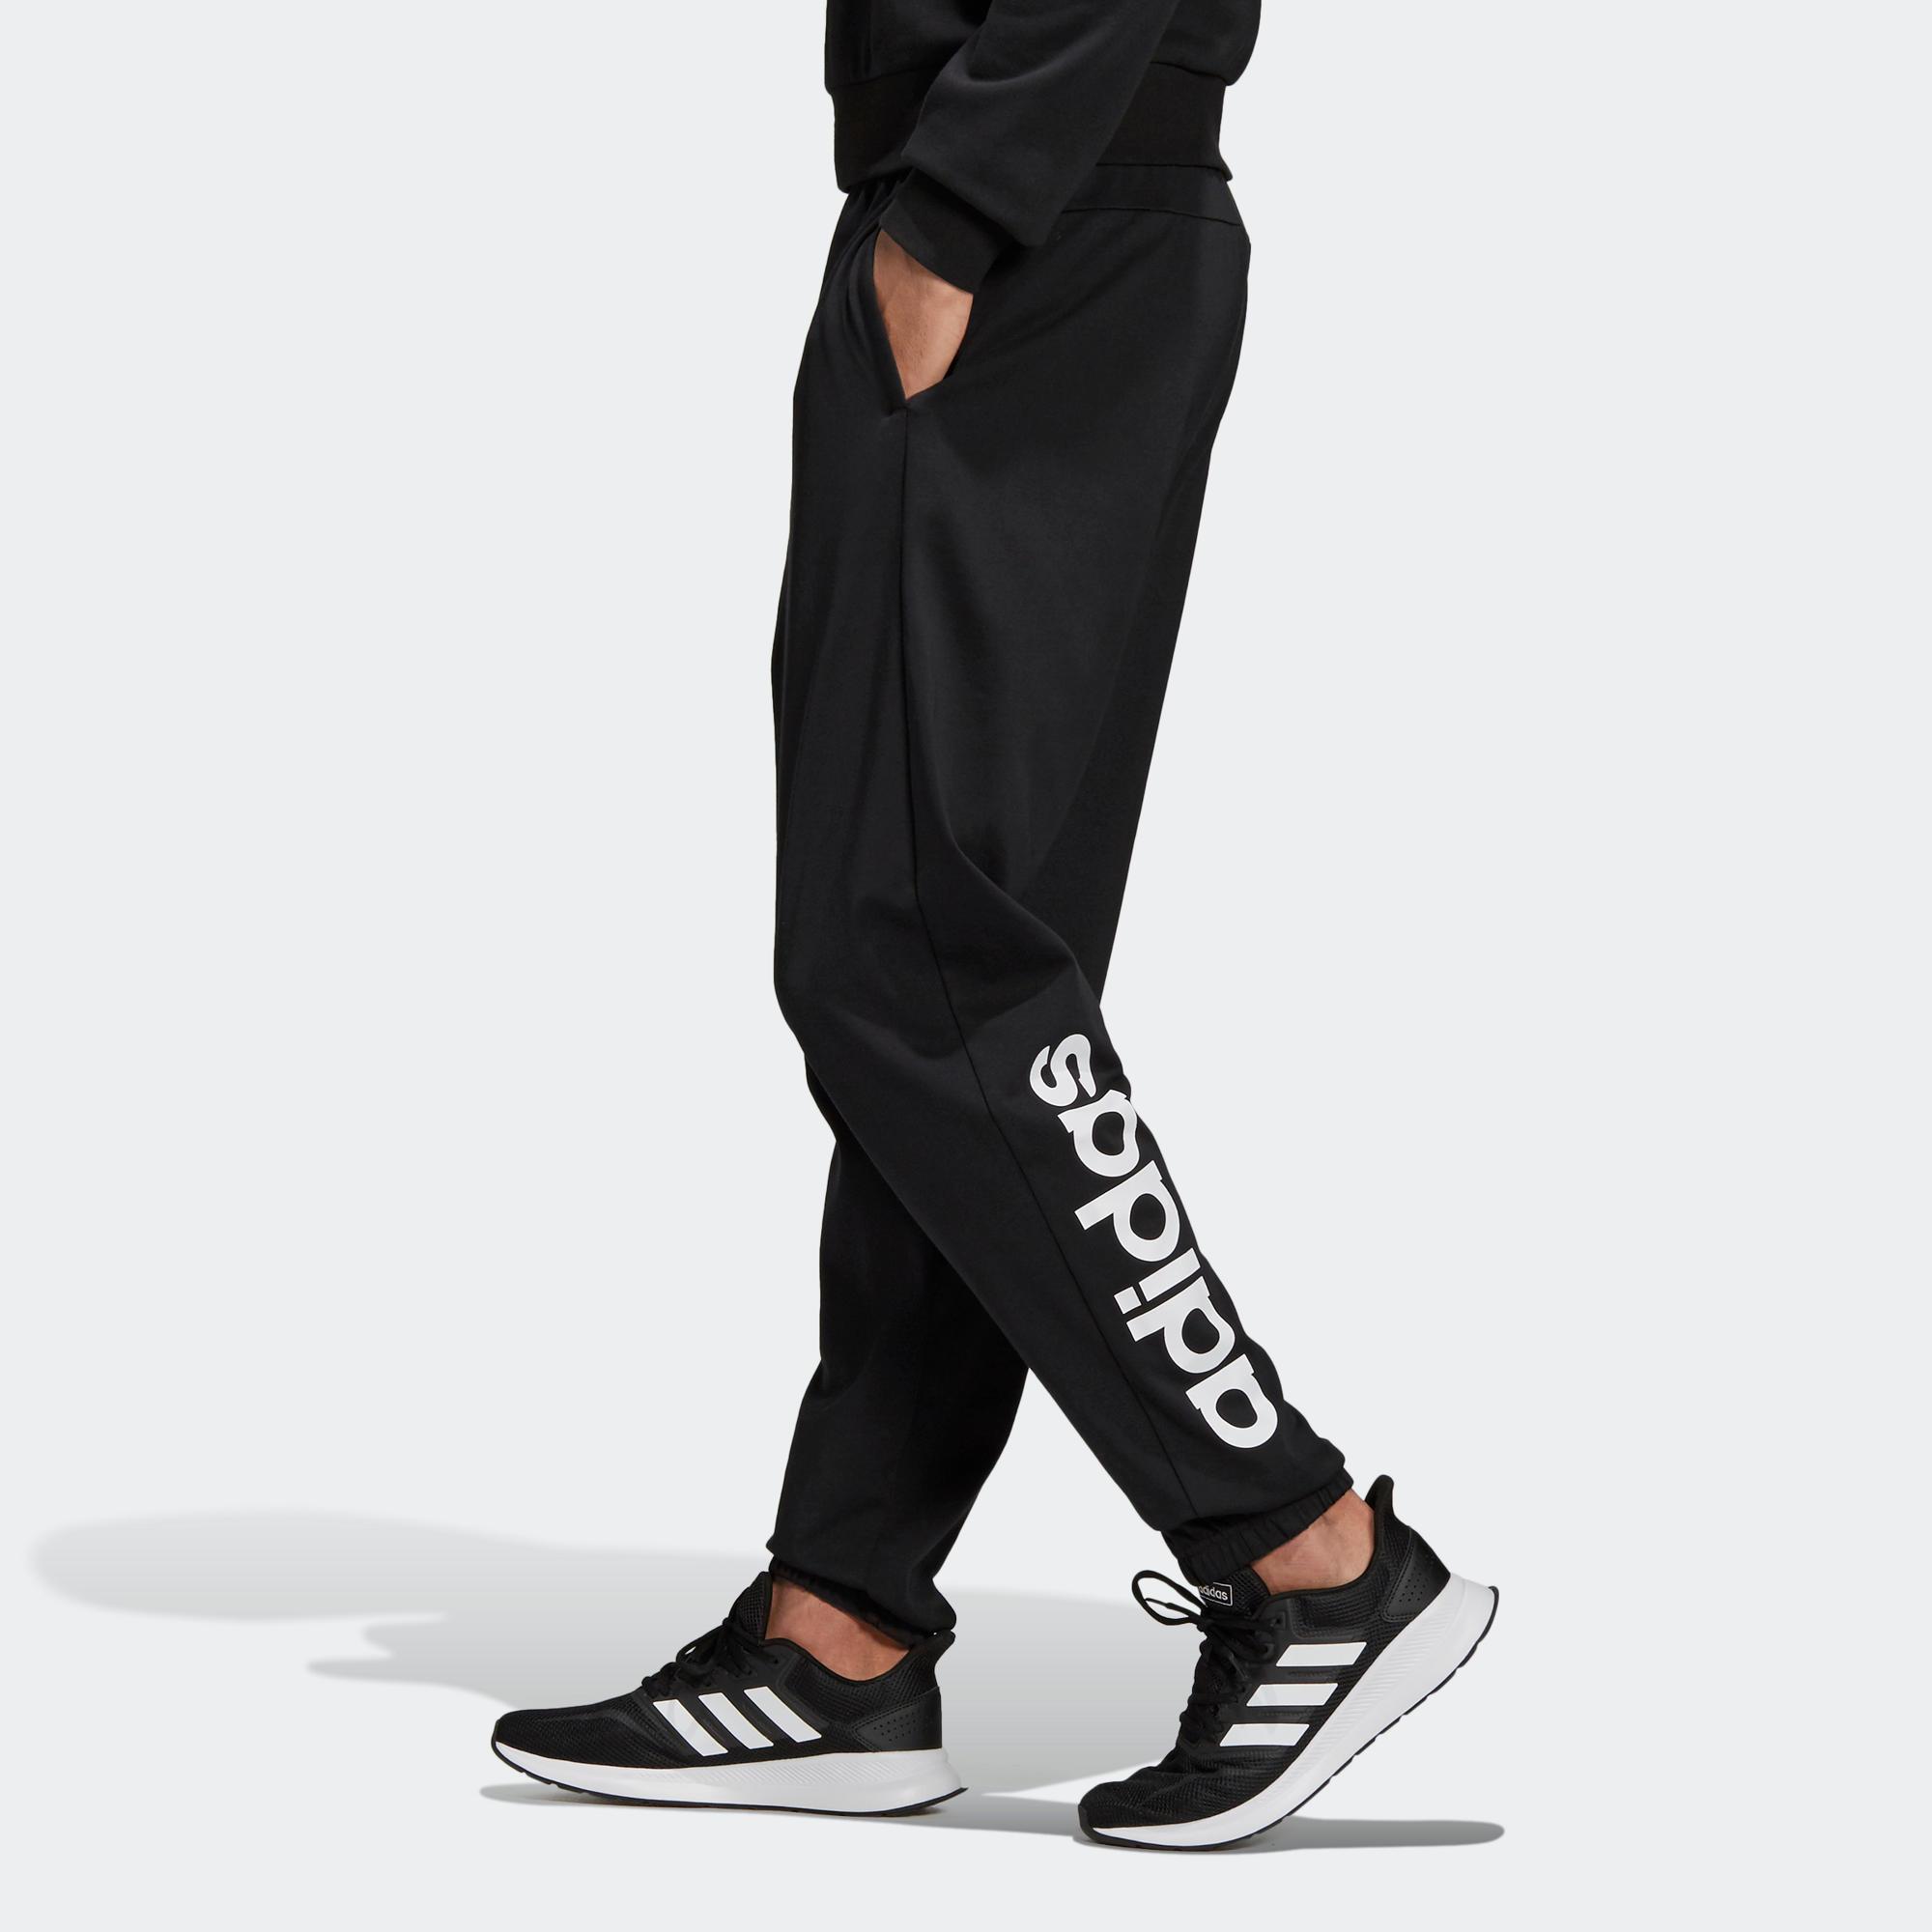 pantaloni adidas bordeaux uomo